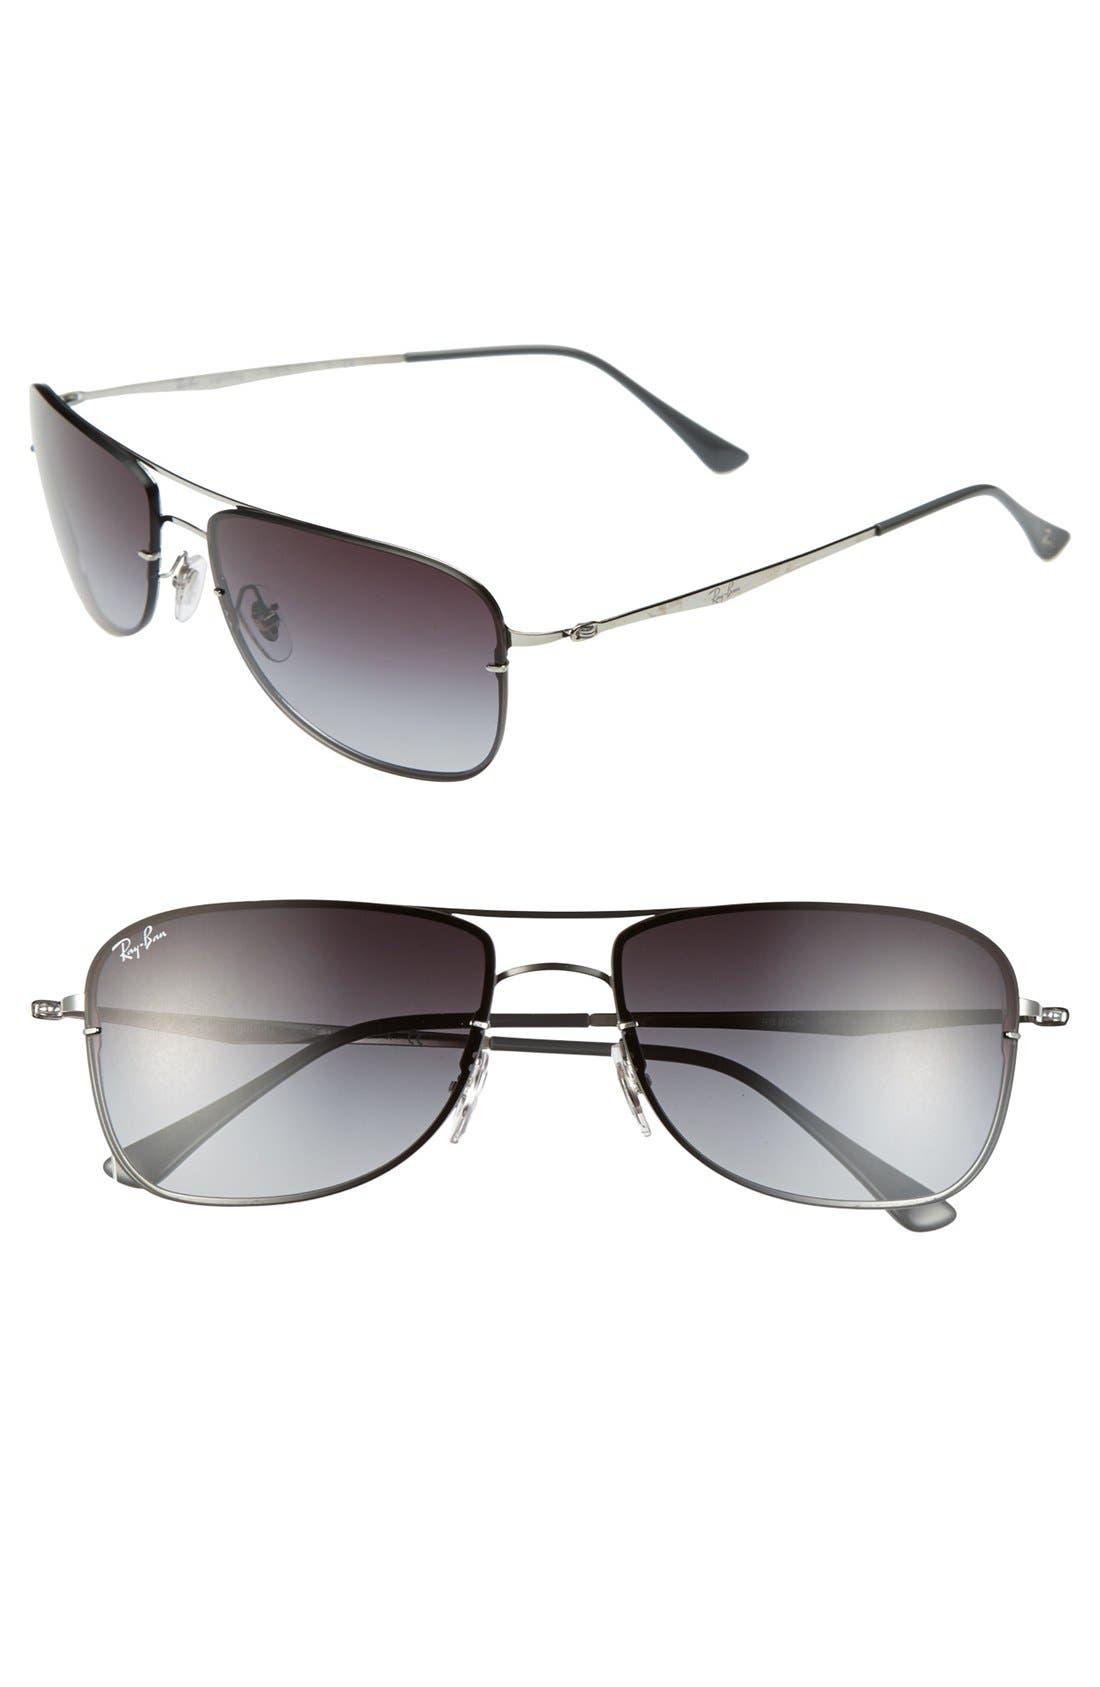 Alternate Image 1 Selected - Ray-Ban 59mm Pilot Sunglasses